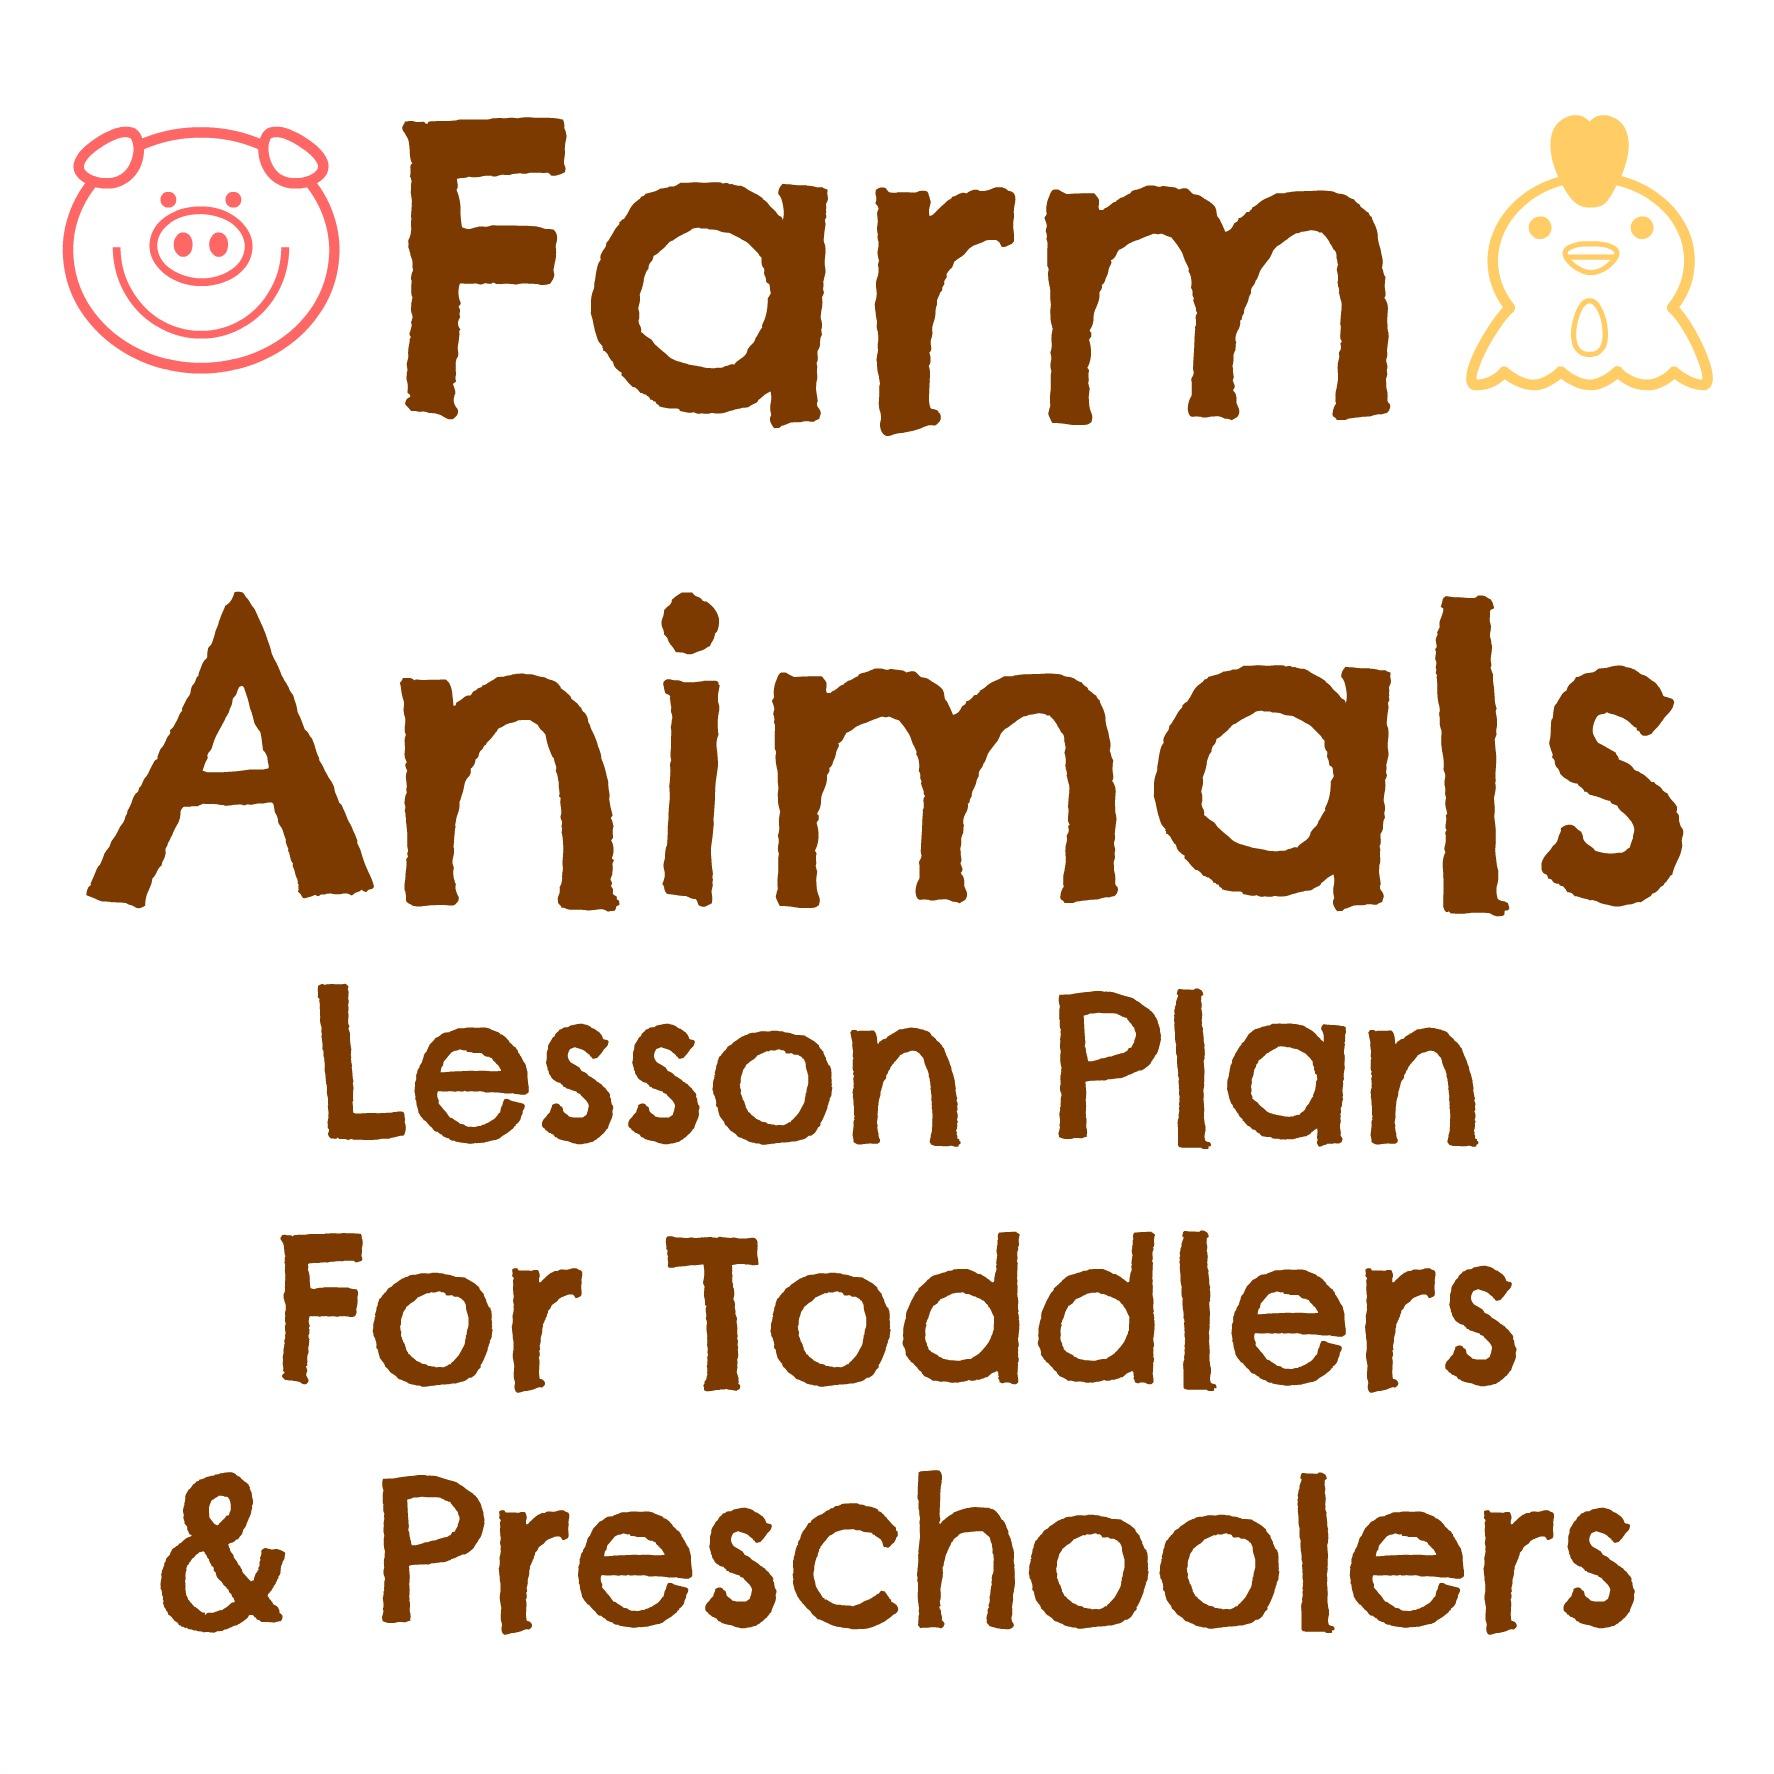 Tot School Farm Animals